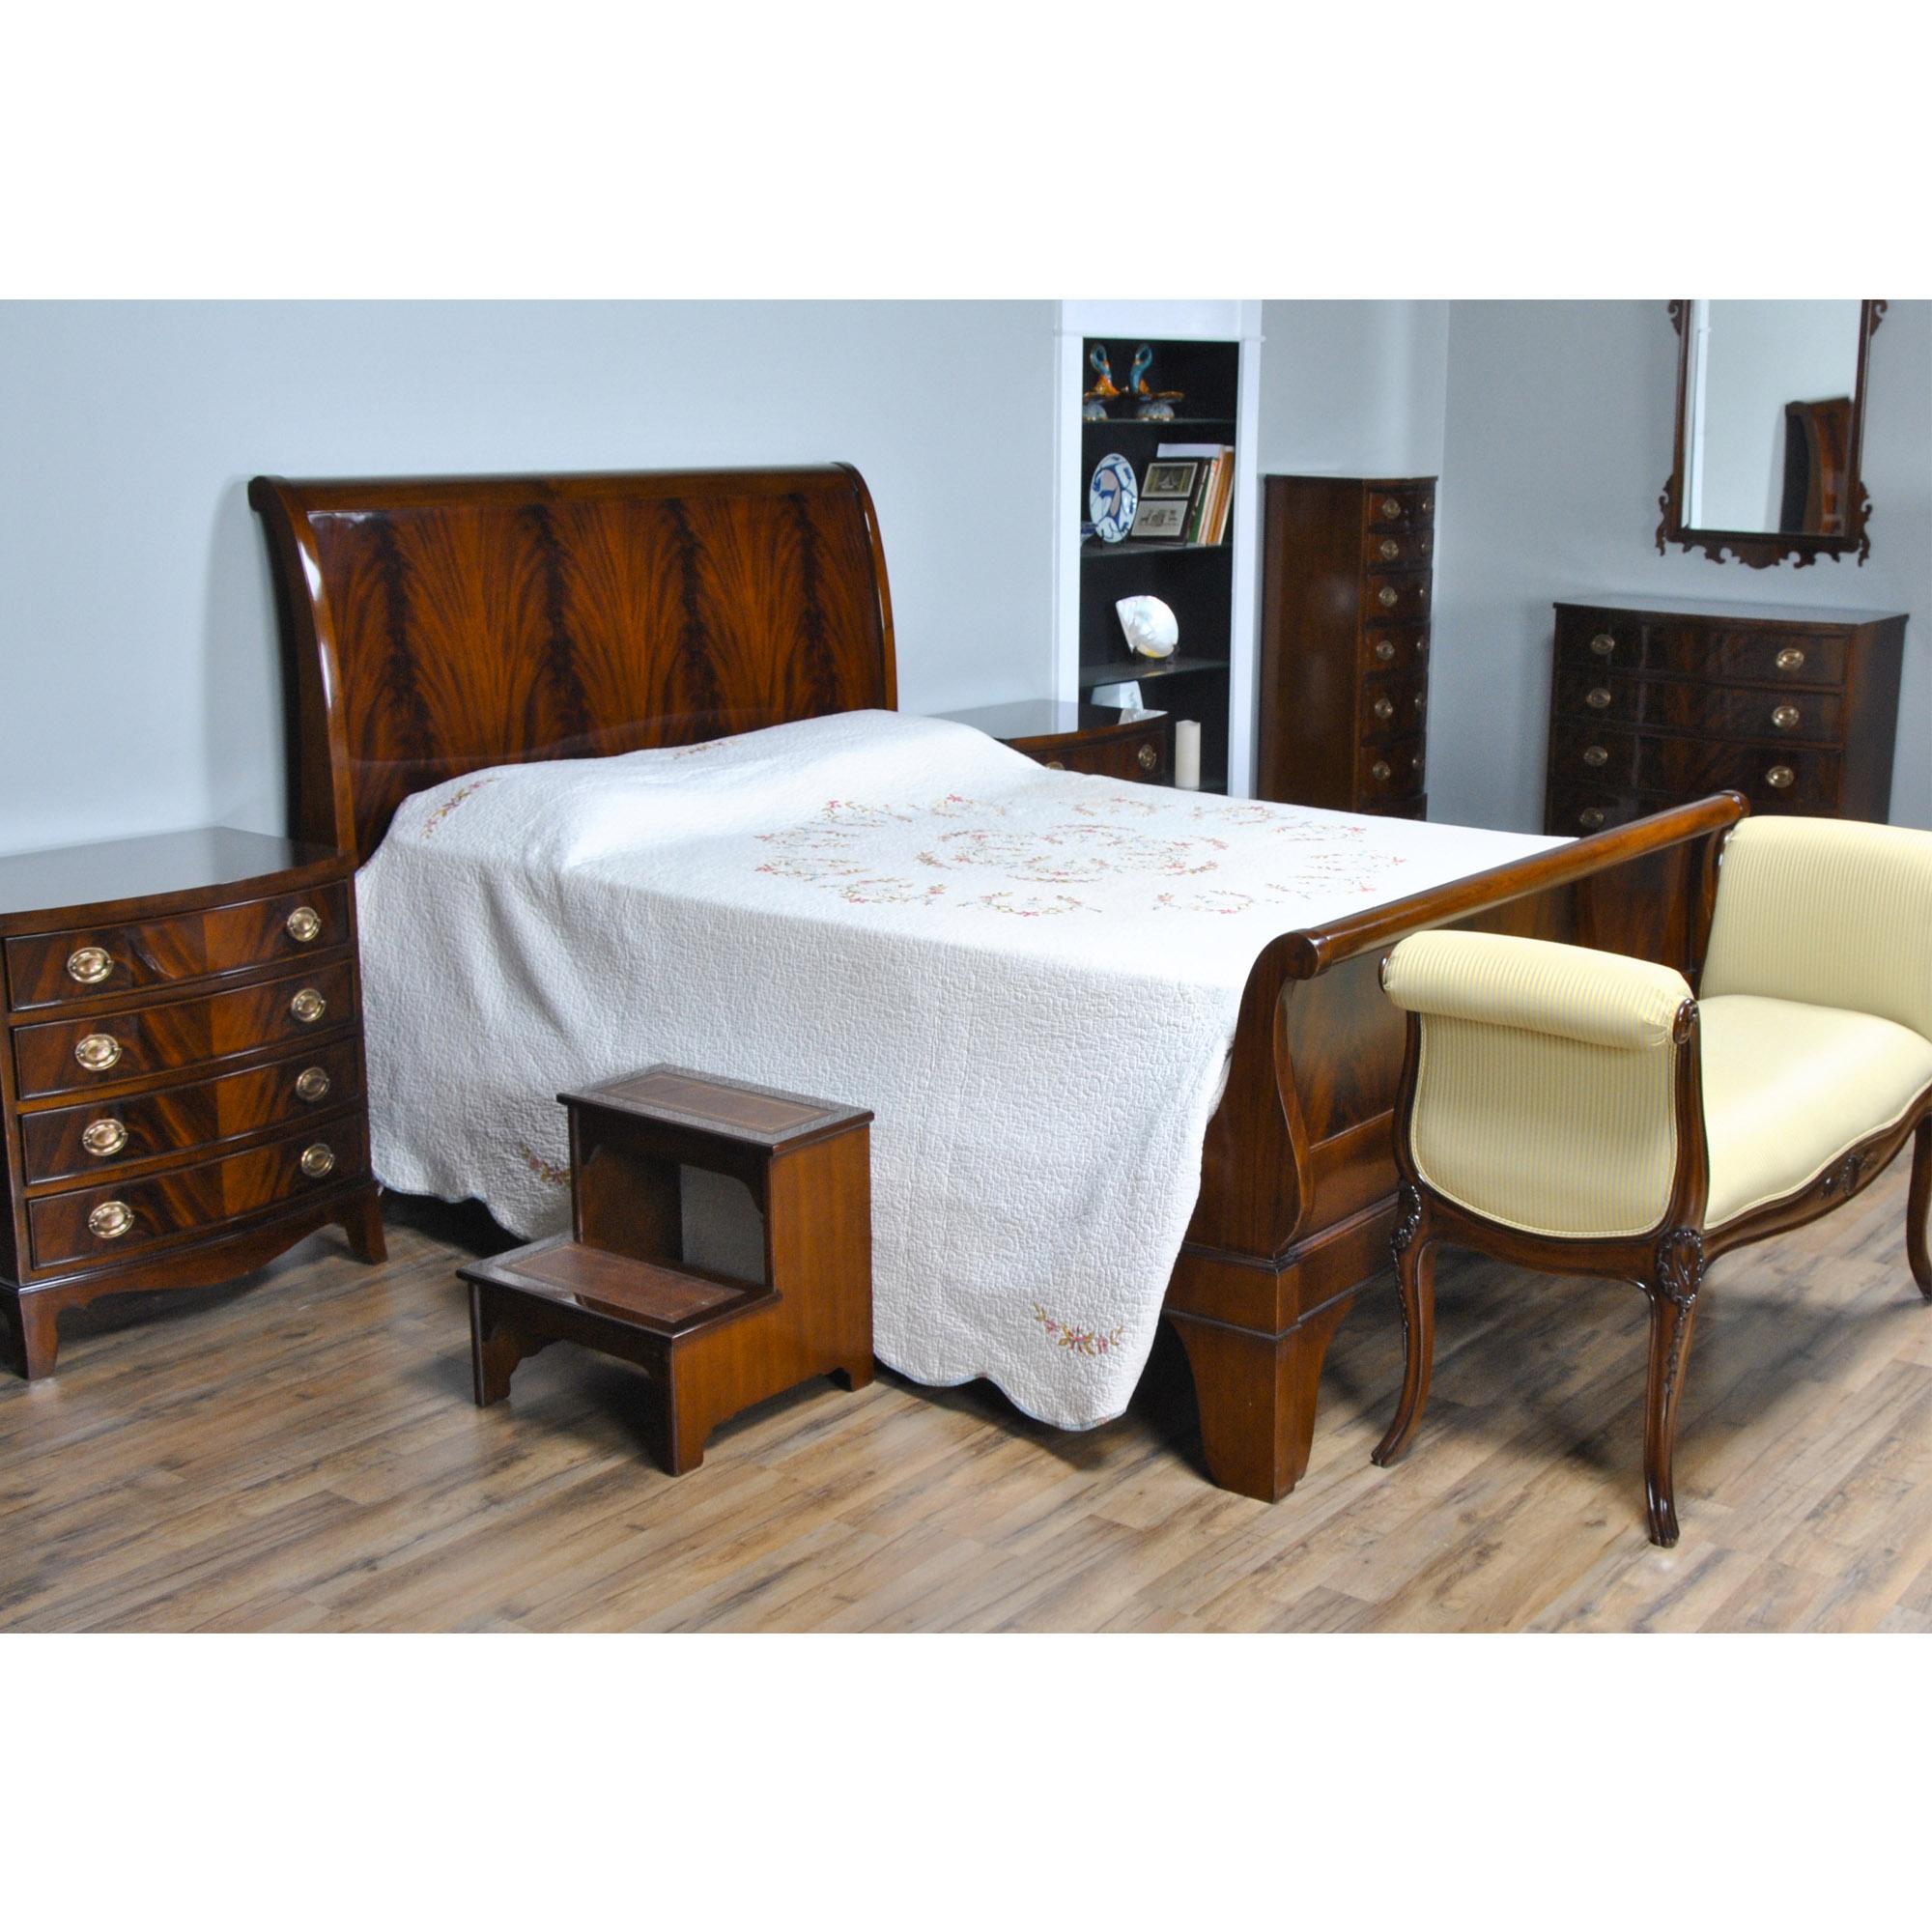 Mahogany King Size Sleigh Bed Niagara Furniture Sleigh Bed